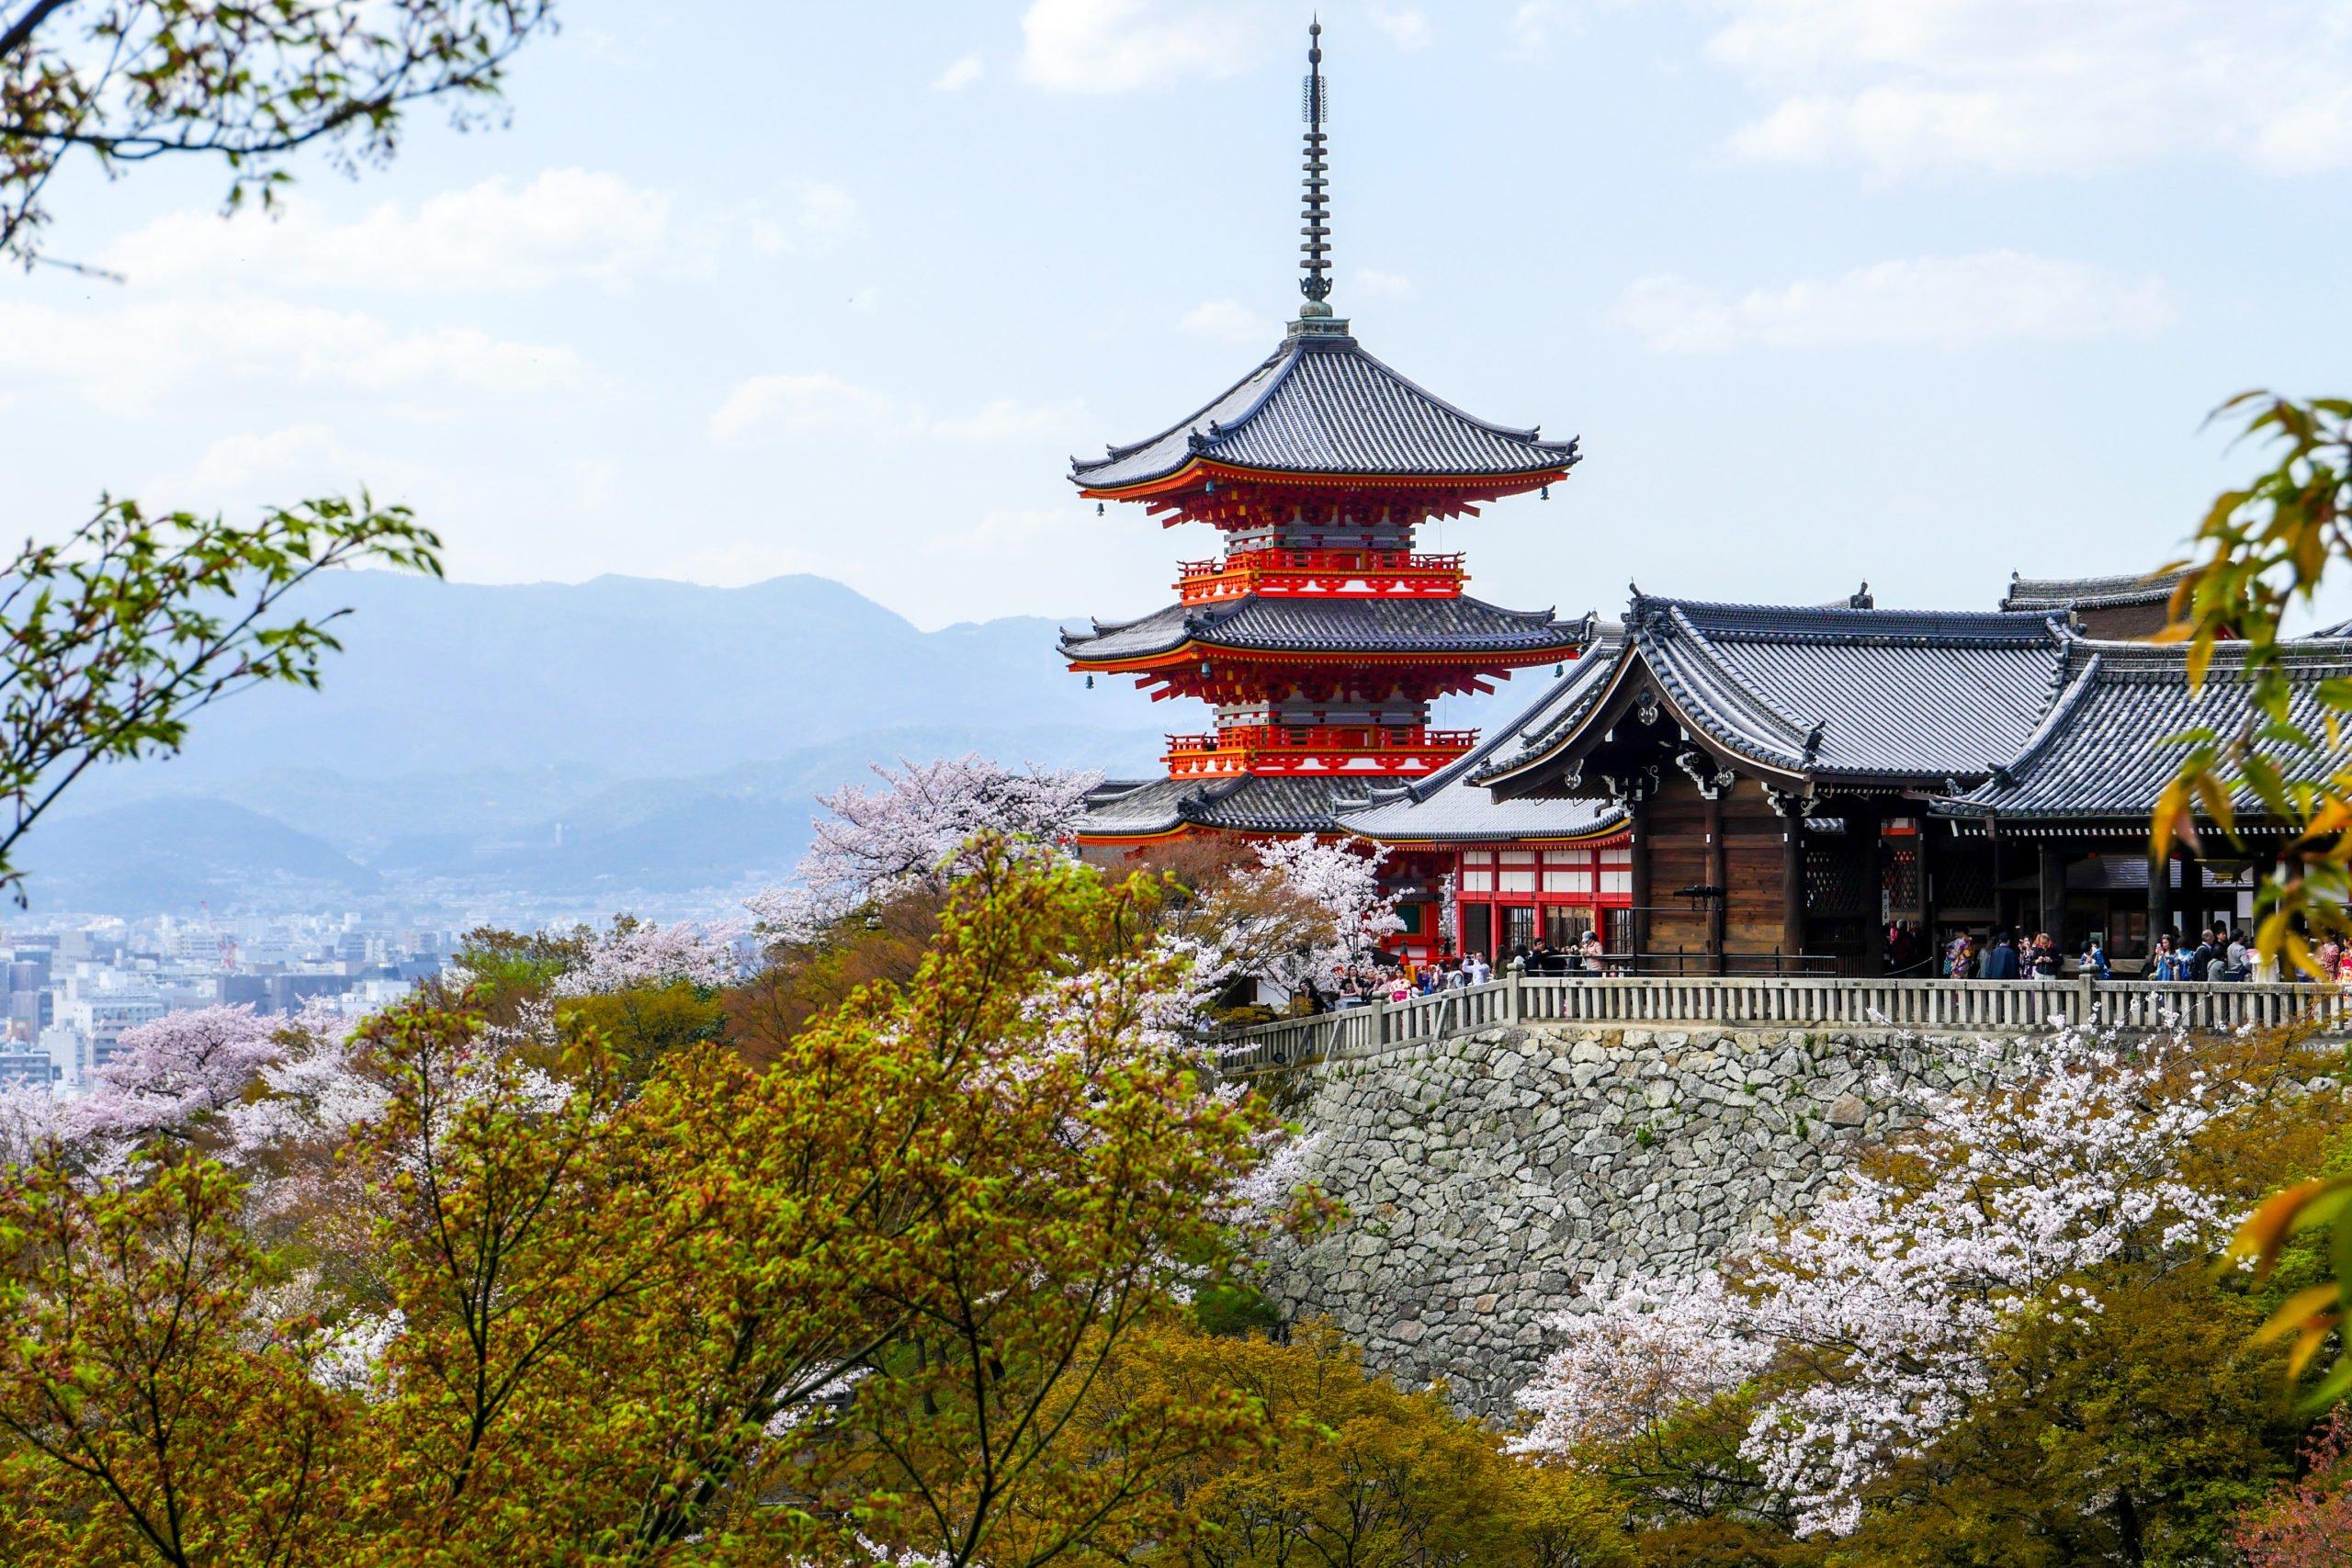 Visit The Kiyomizu-dera Temple